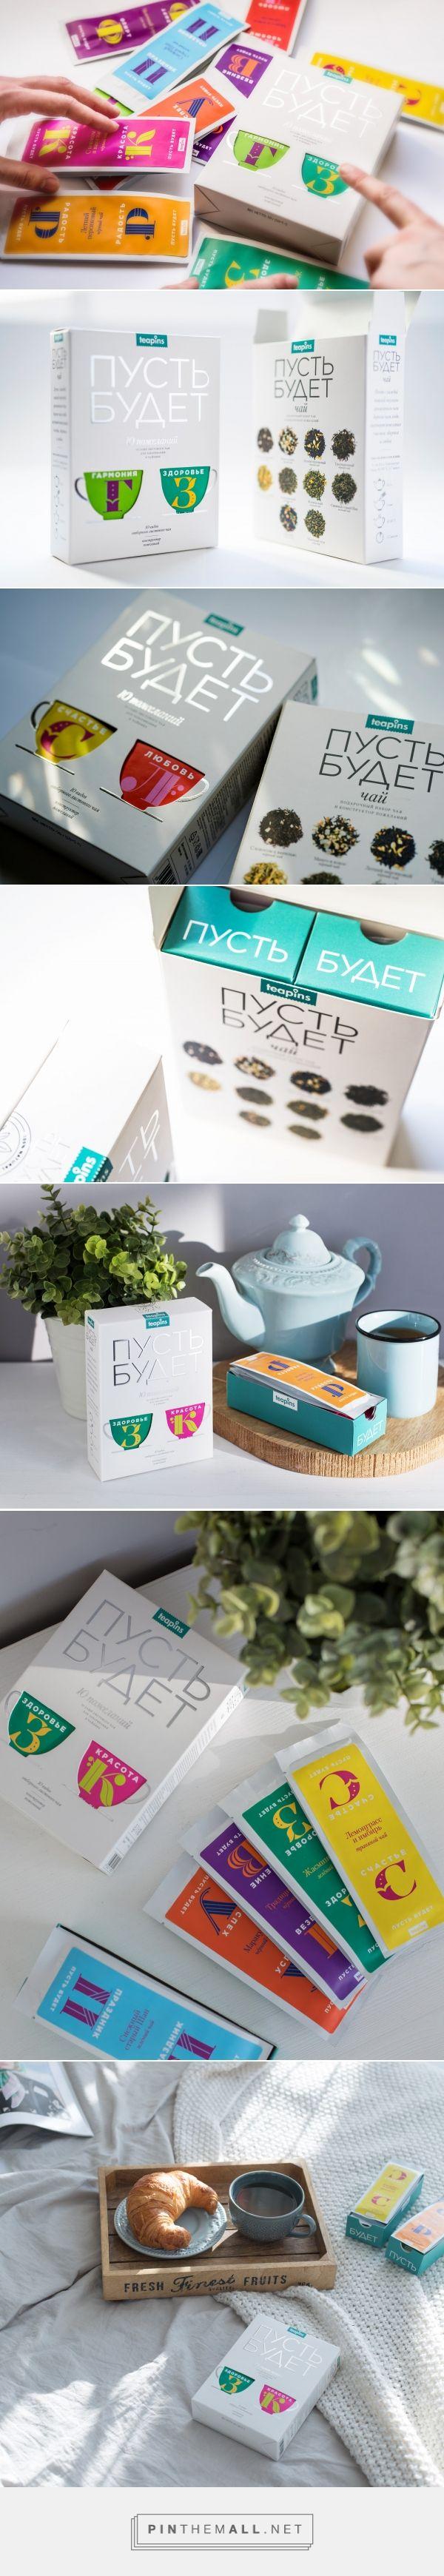 I Wish You - tea gift packaging design by Ohmybrand - https://www.packagingoftheworld.com/2018/04/i-wish-you.html